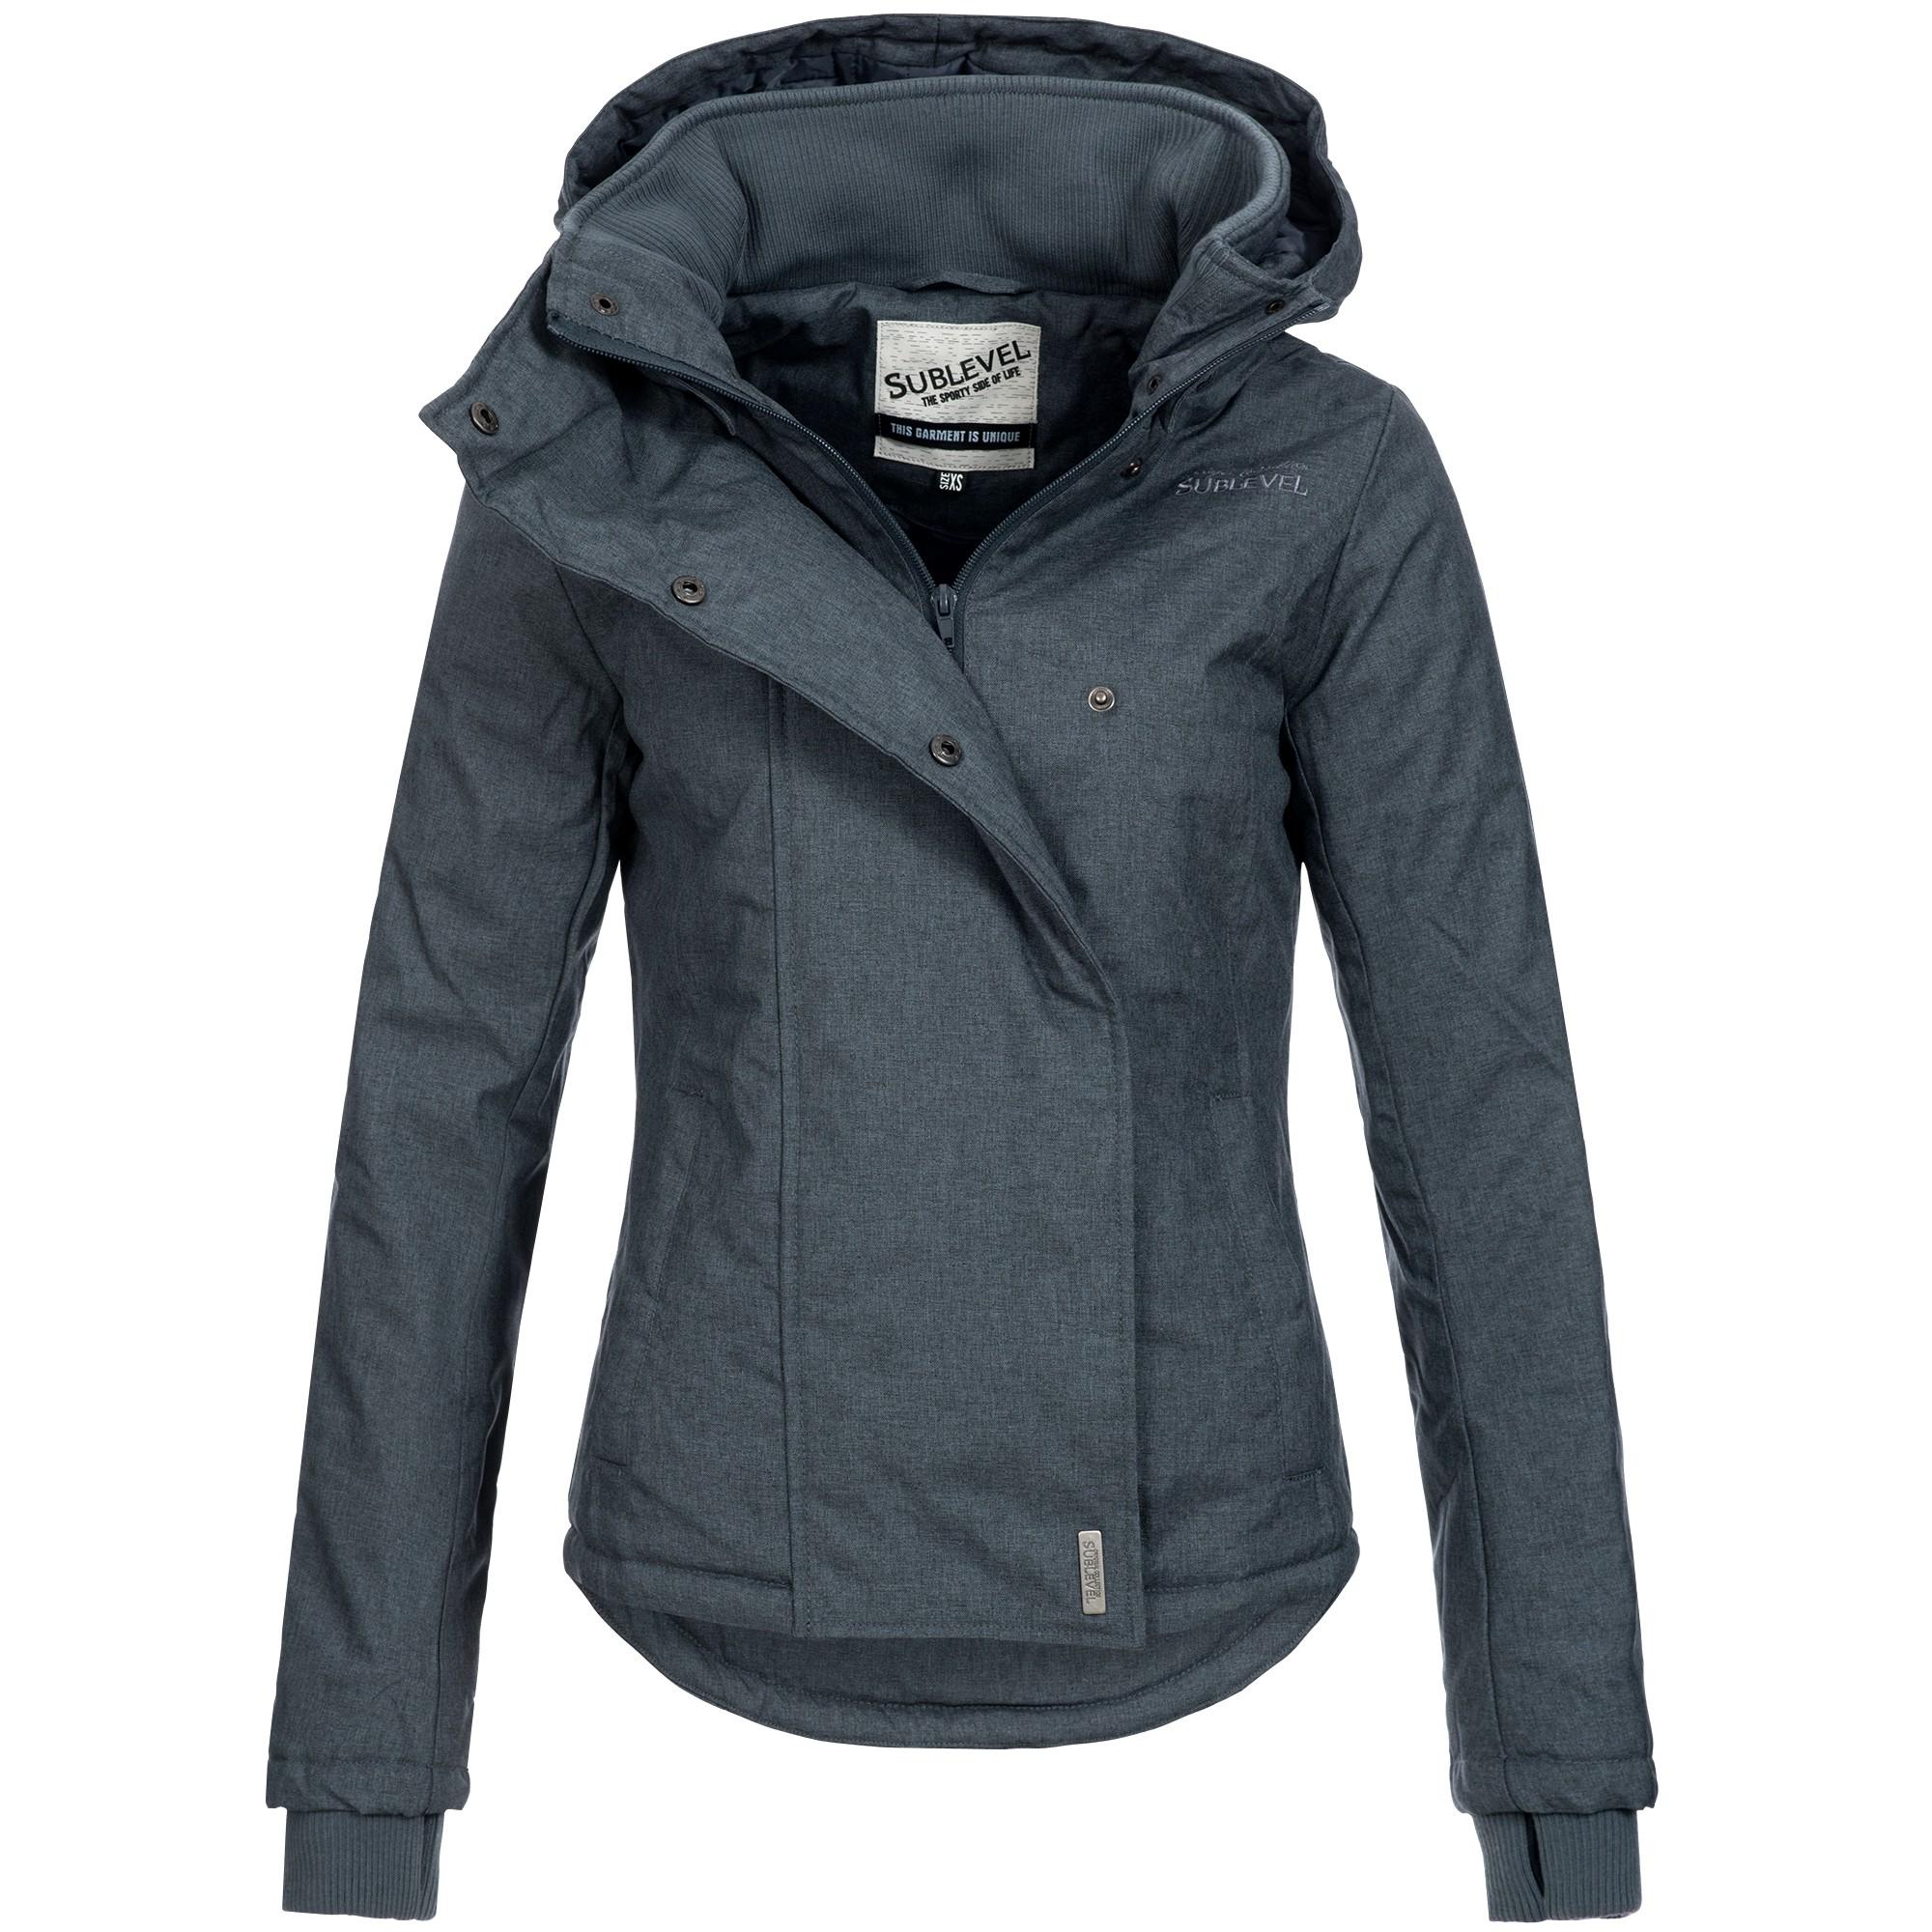 cfd6129be401ab Sublevel Damen Herbst Winter Jacke Mantel Parka Outdoor Stepp Winterjacke  46550 XS-XL